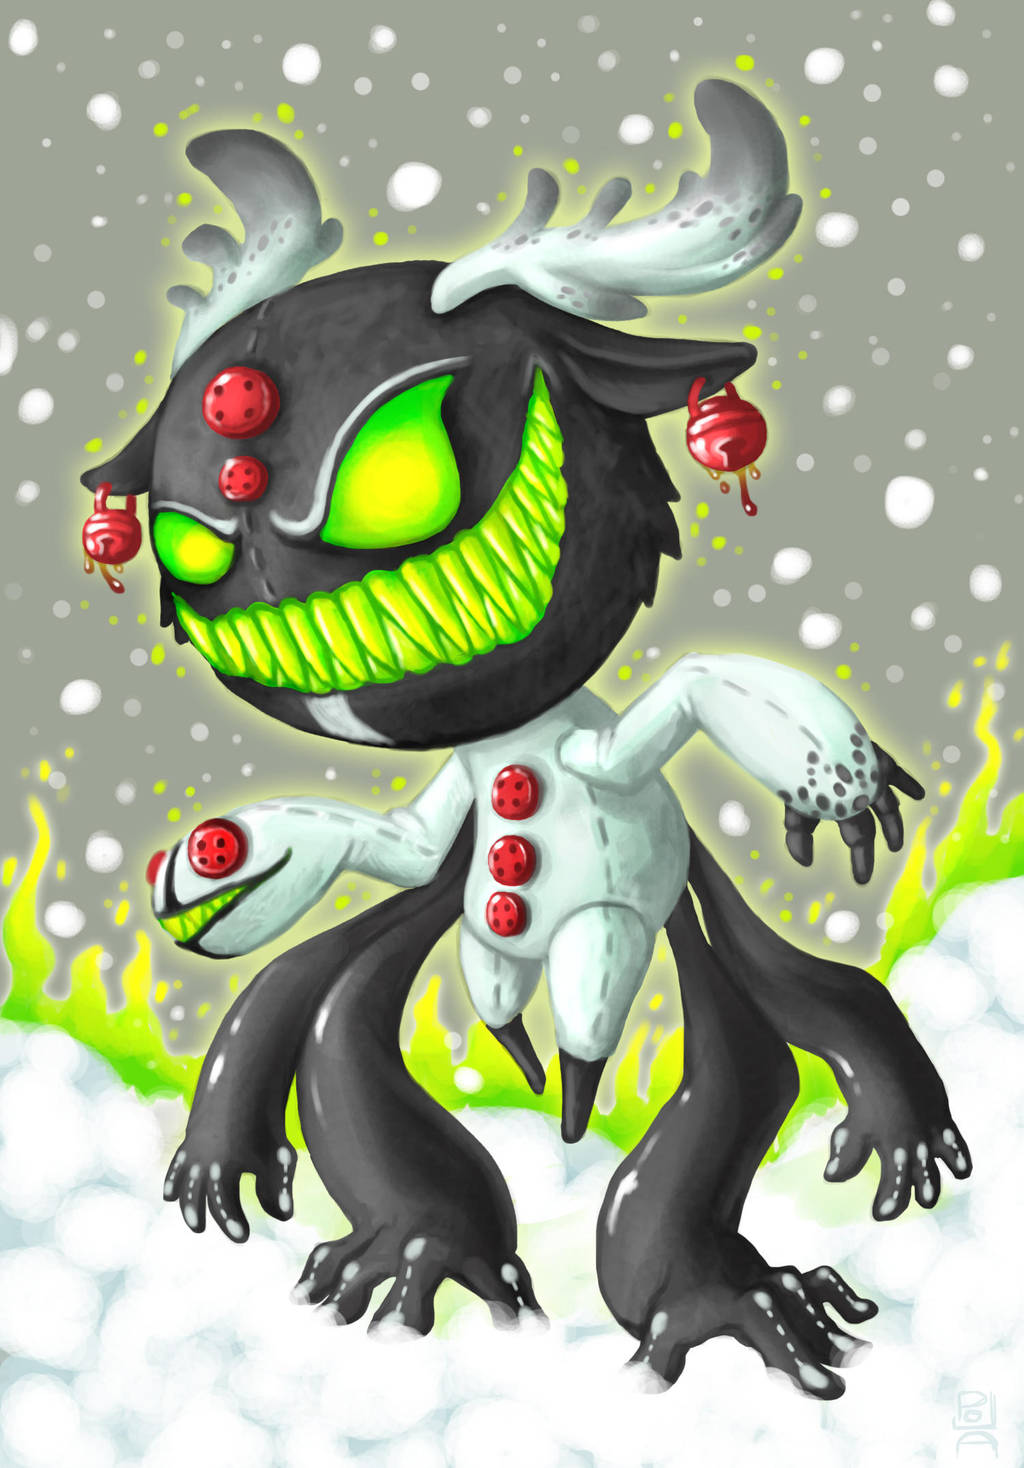 Doll Devil : X'mas by polawat